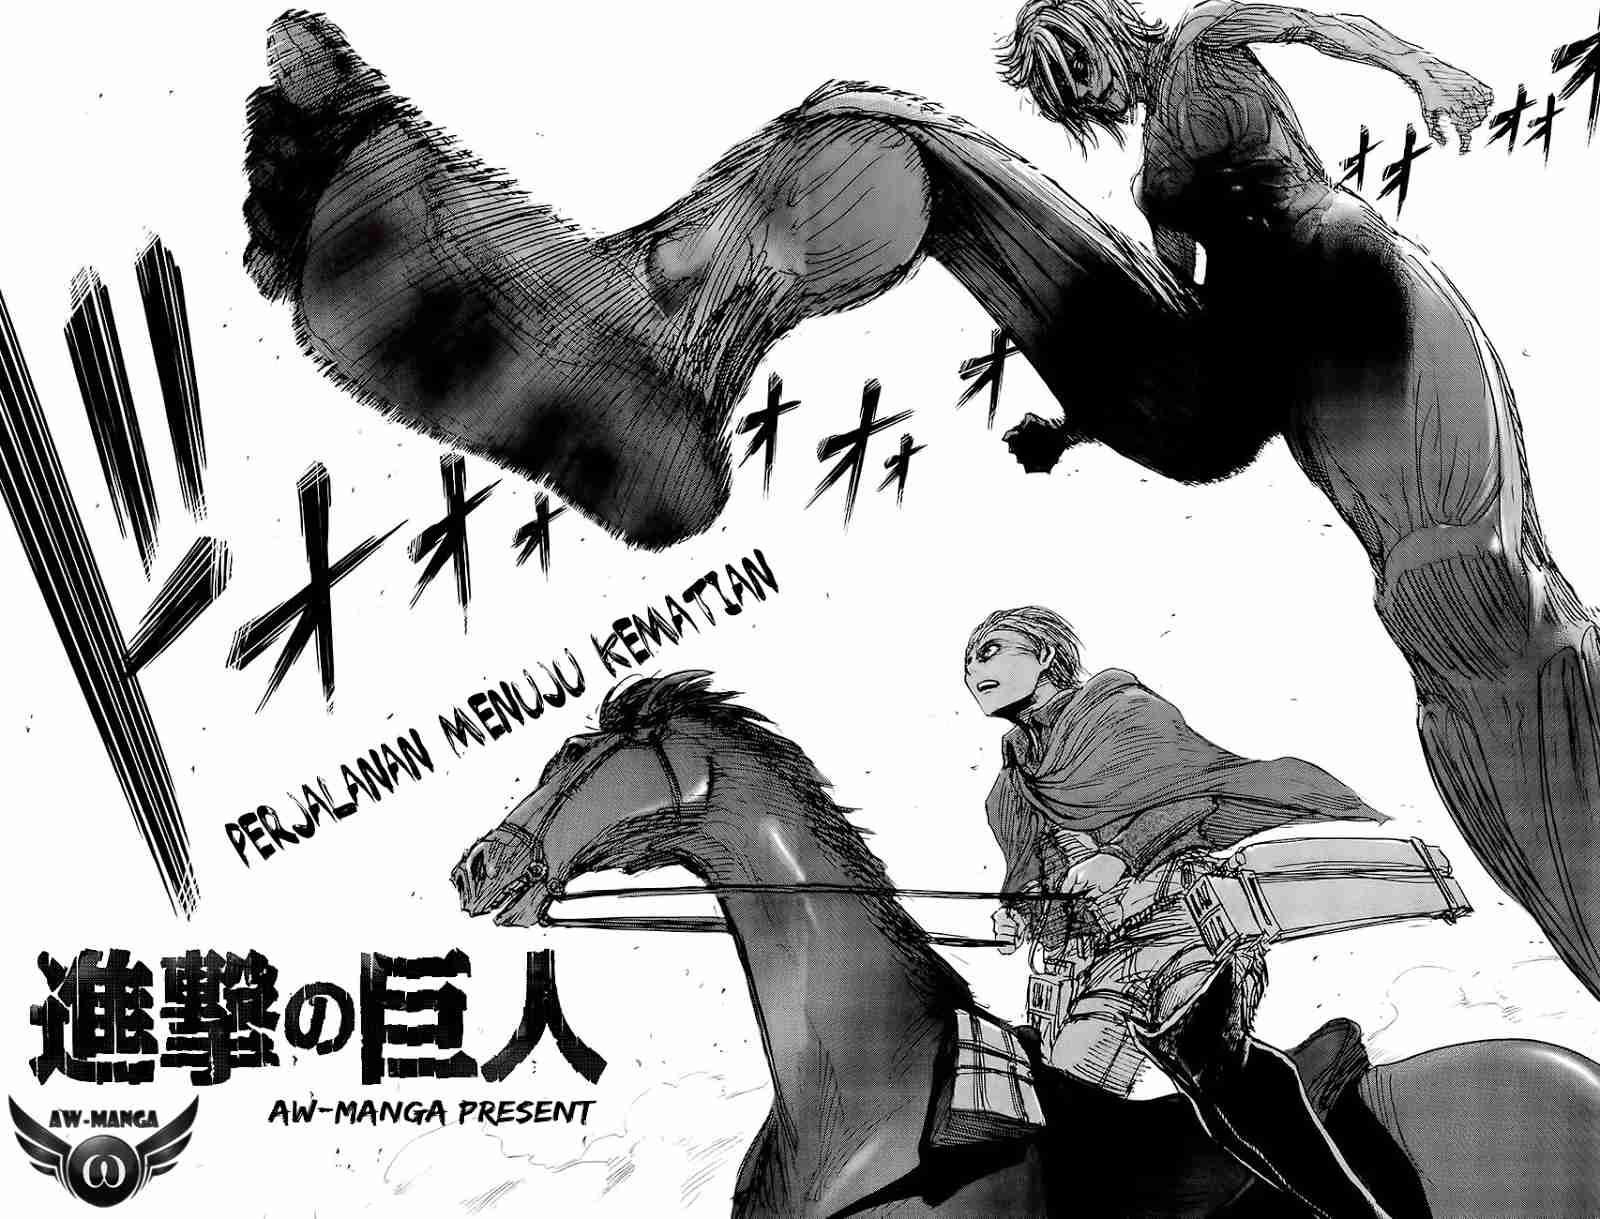 Komik shingeki no kyojin 023 - titan wanita 24 Indonesia shingeki no kyojin 023 - titan wanita Terbaru 6|Baca Manga Komik Indonesia|Mangacan